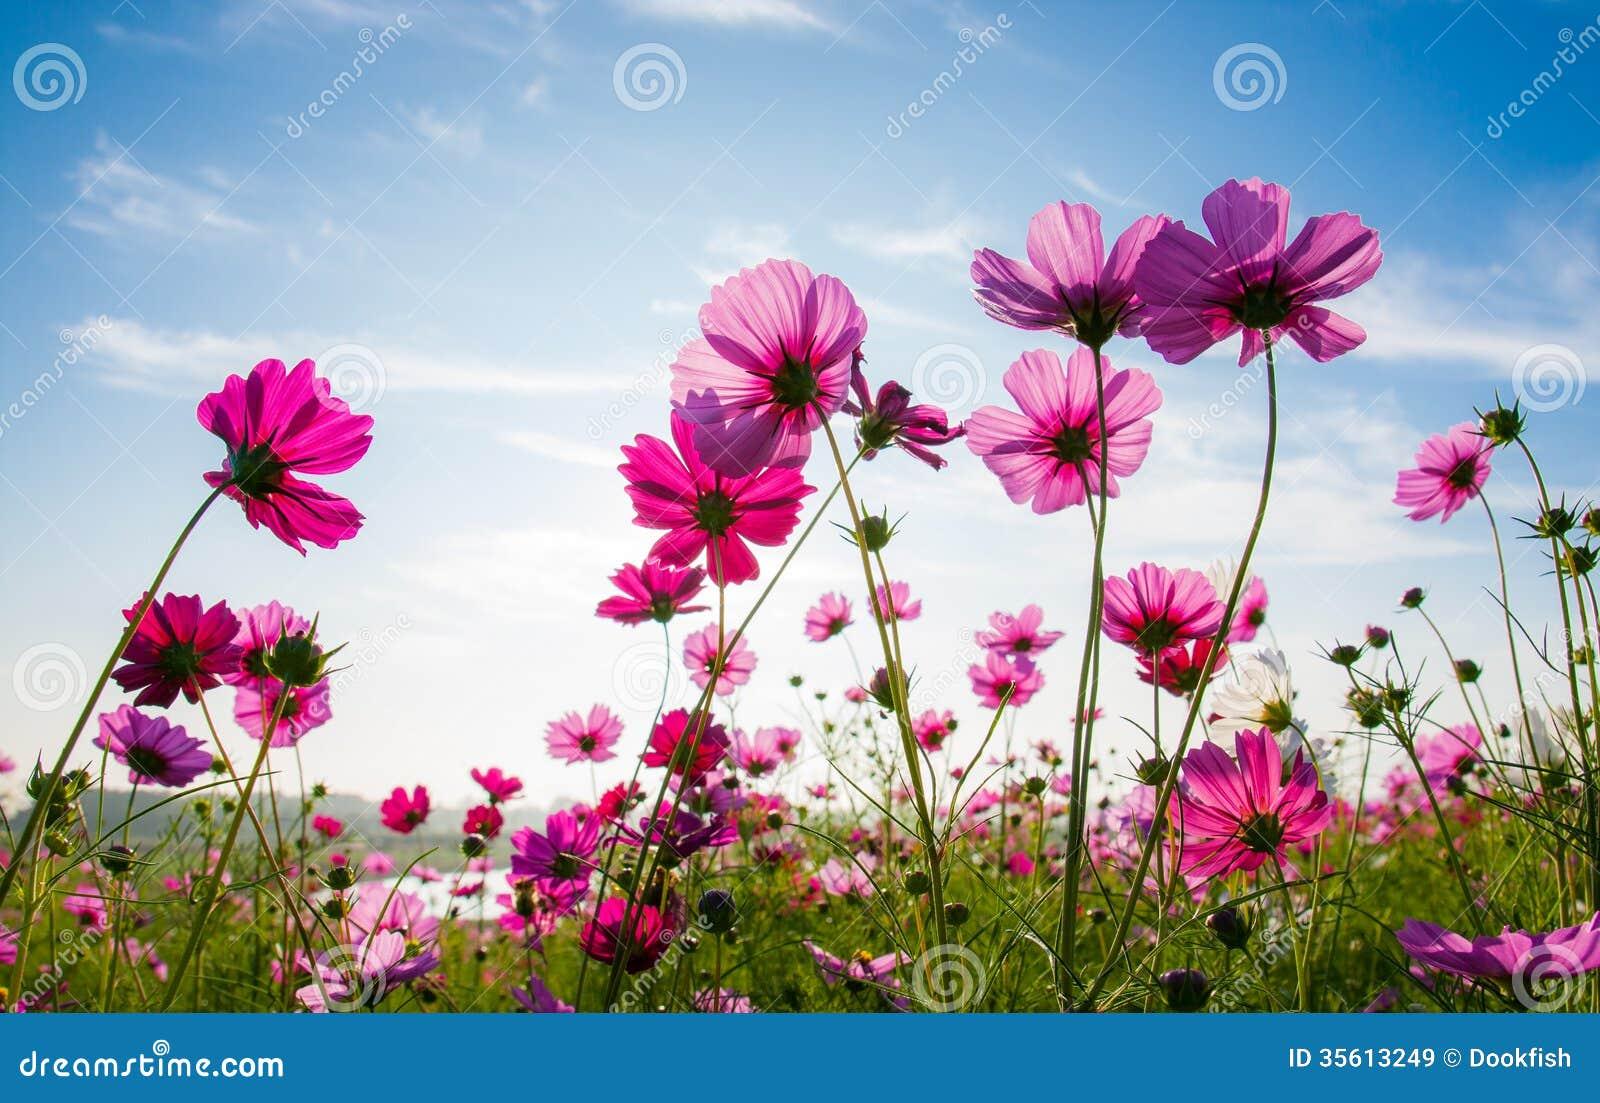 Free Clipart Autumn Flowers